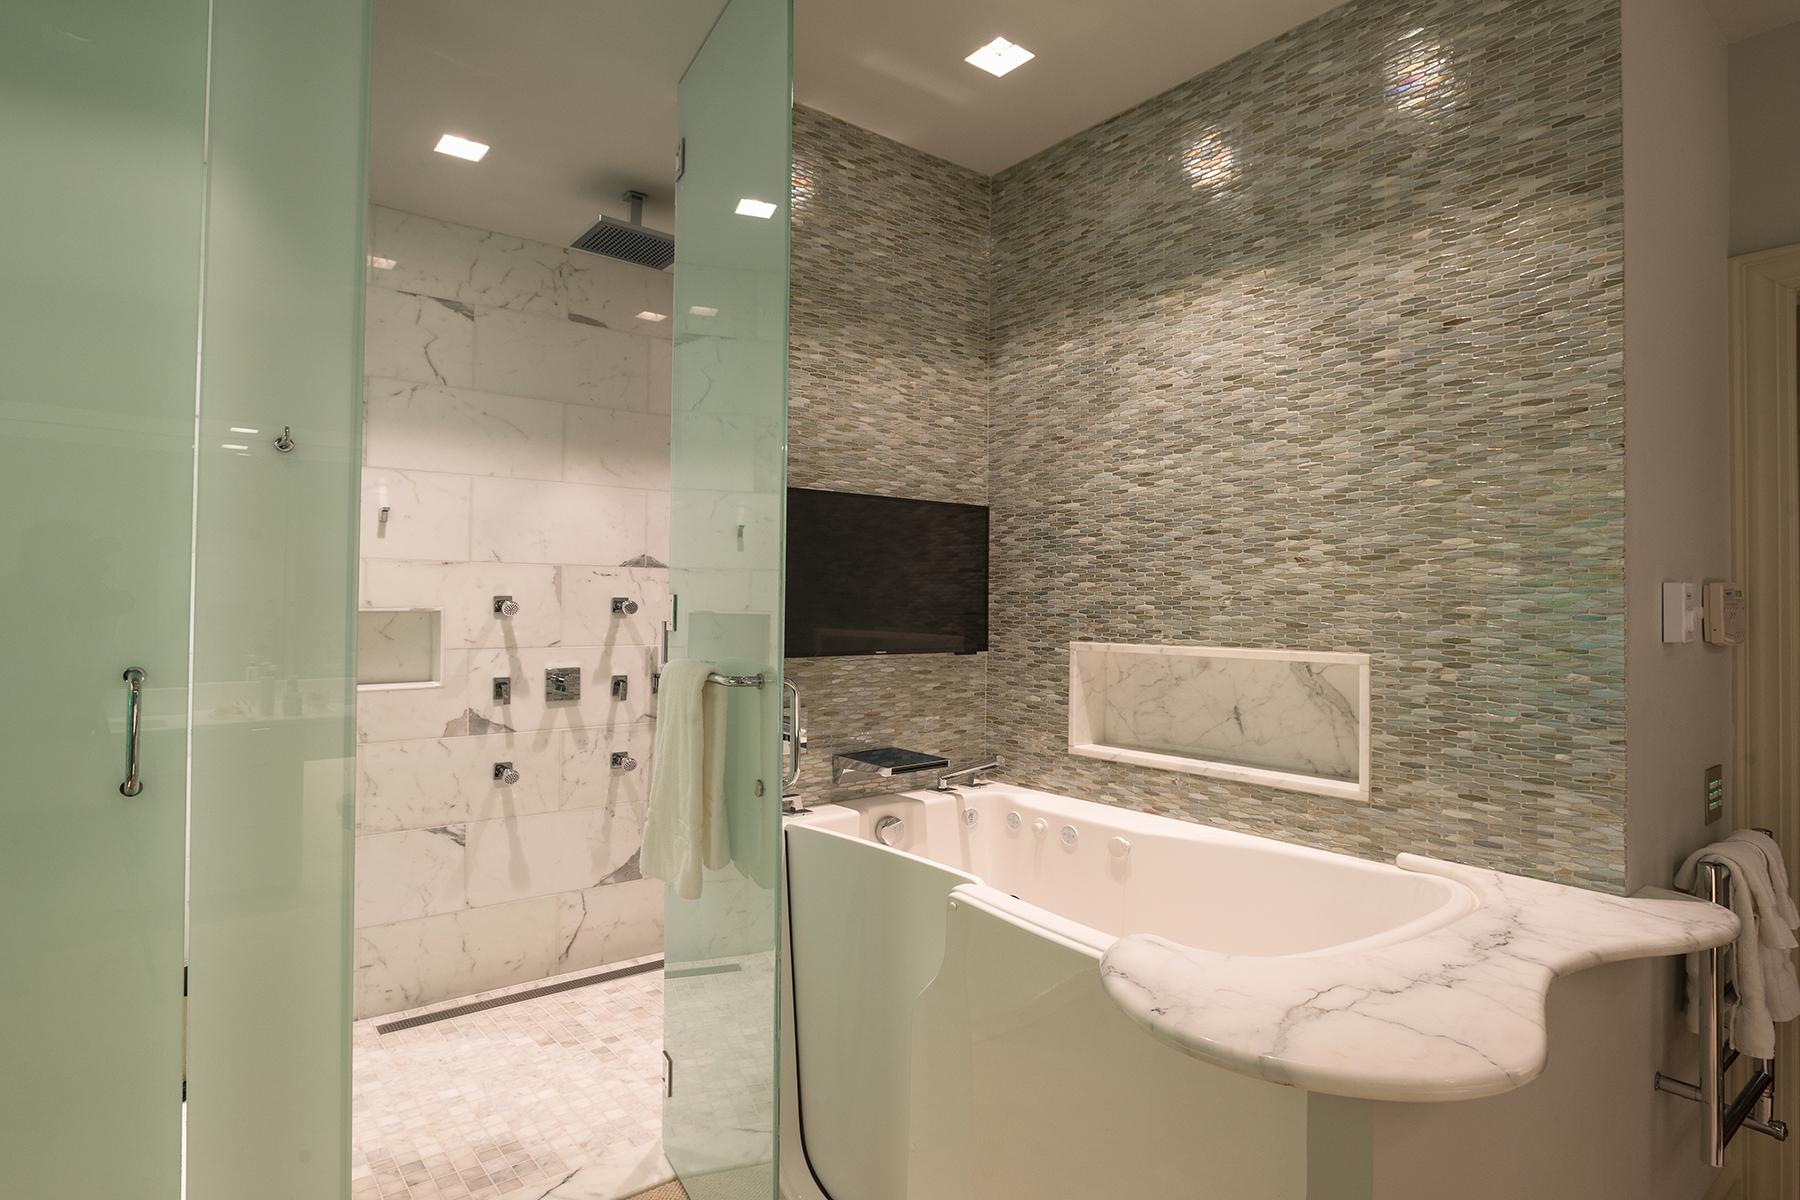 Additional photo for property listing at LINVILLE RIDGE 219  Ridge Drive,  Linville, North Carolina 28646 United States